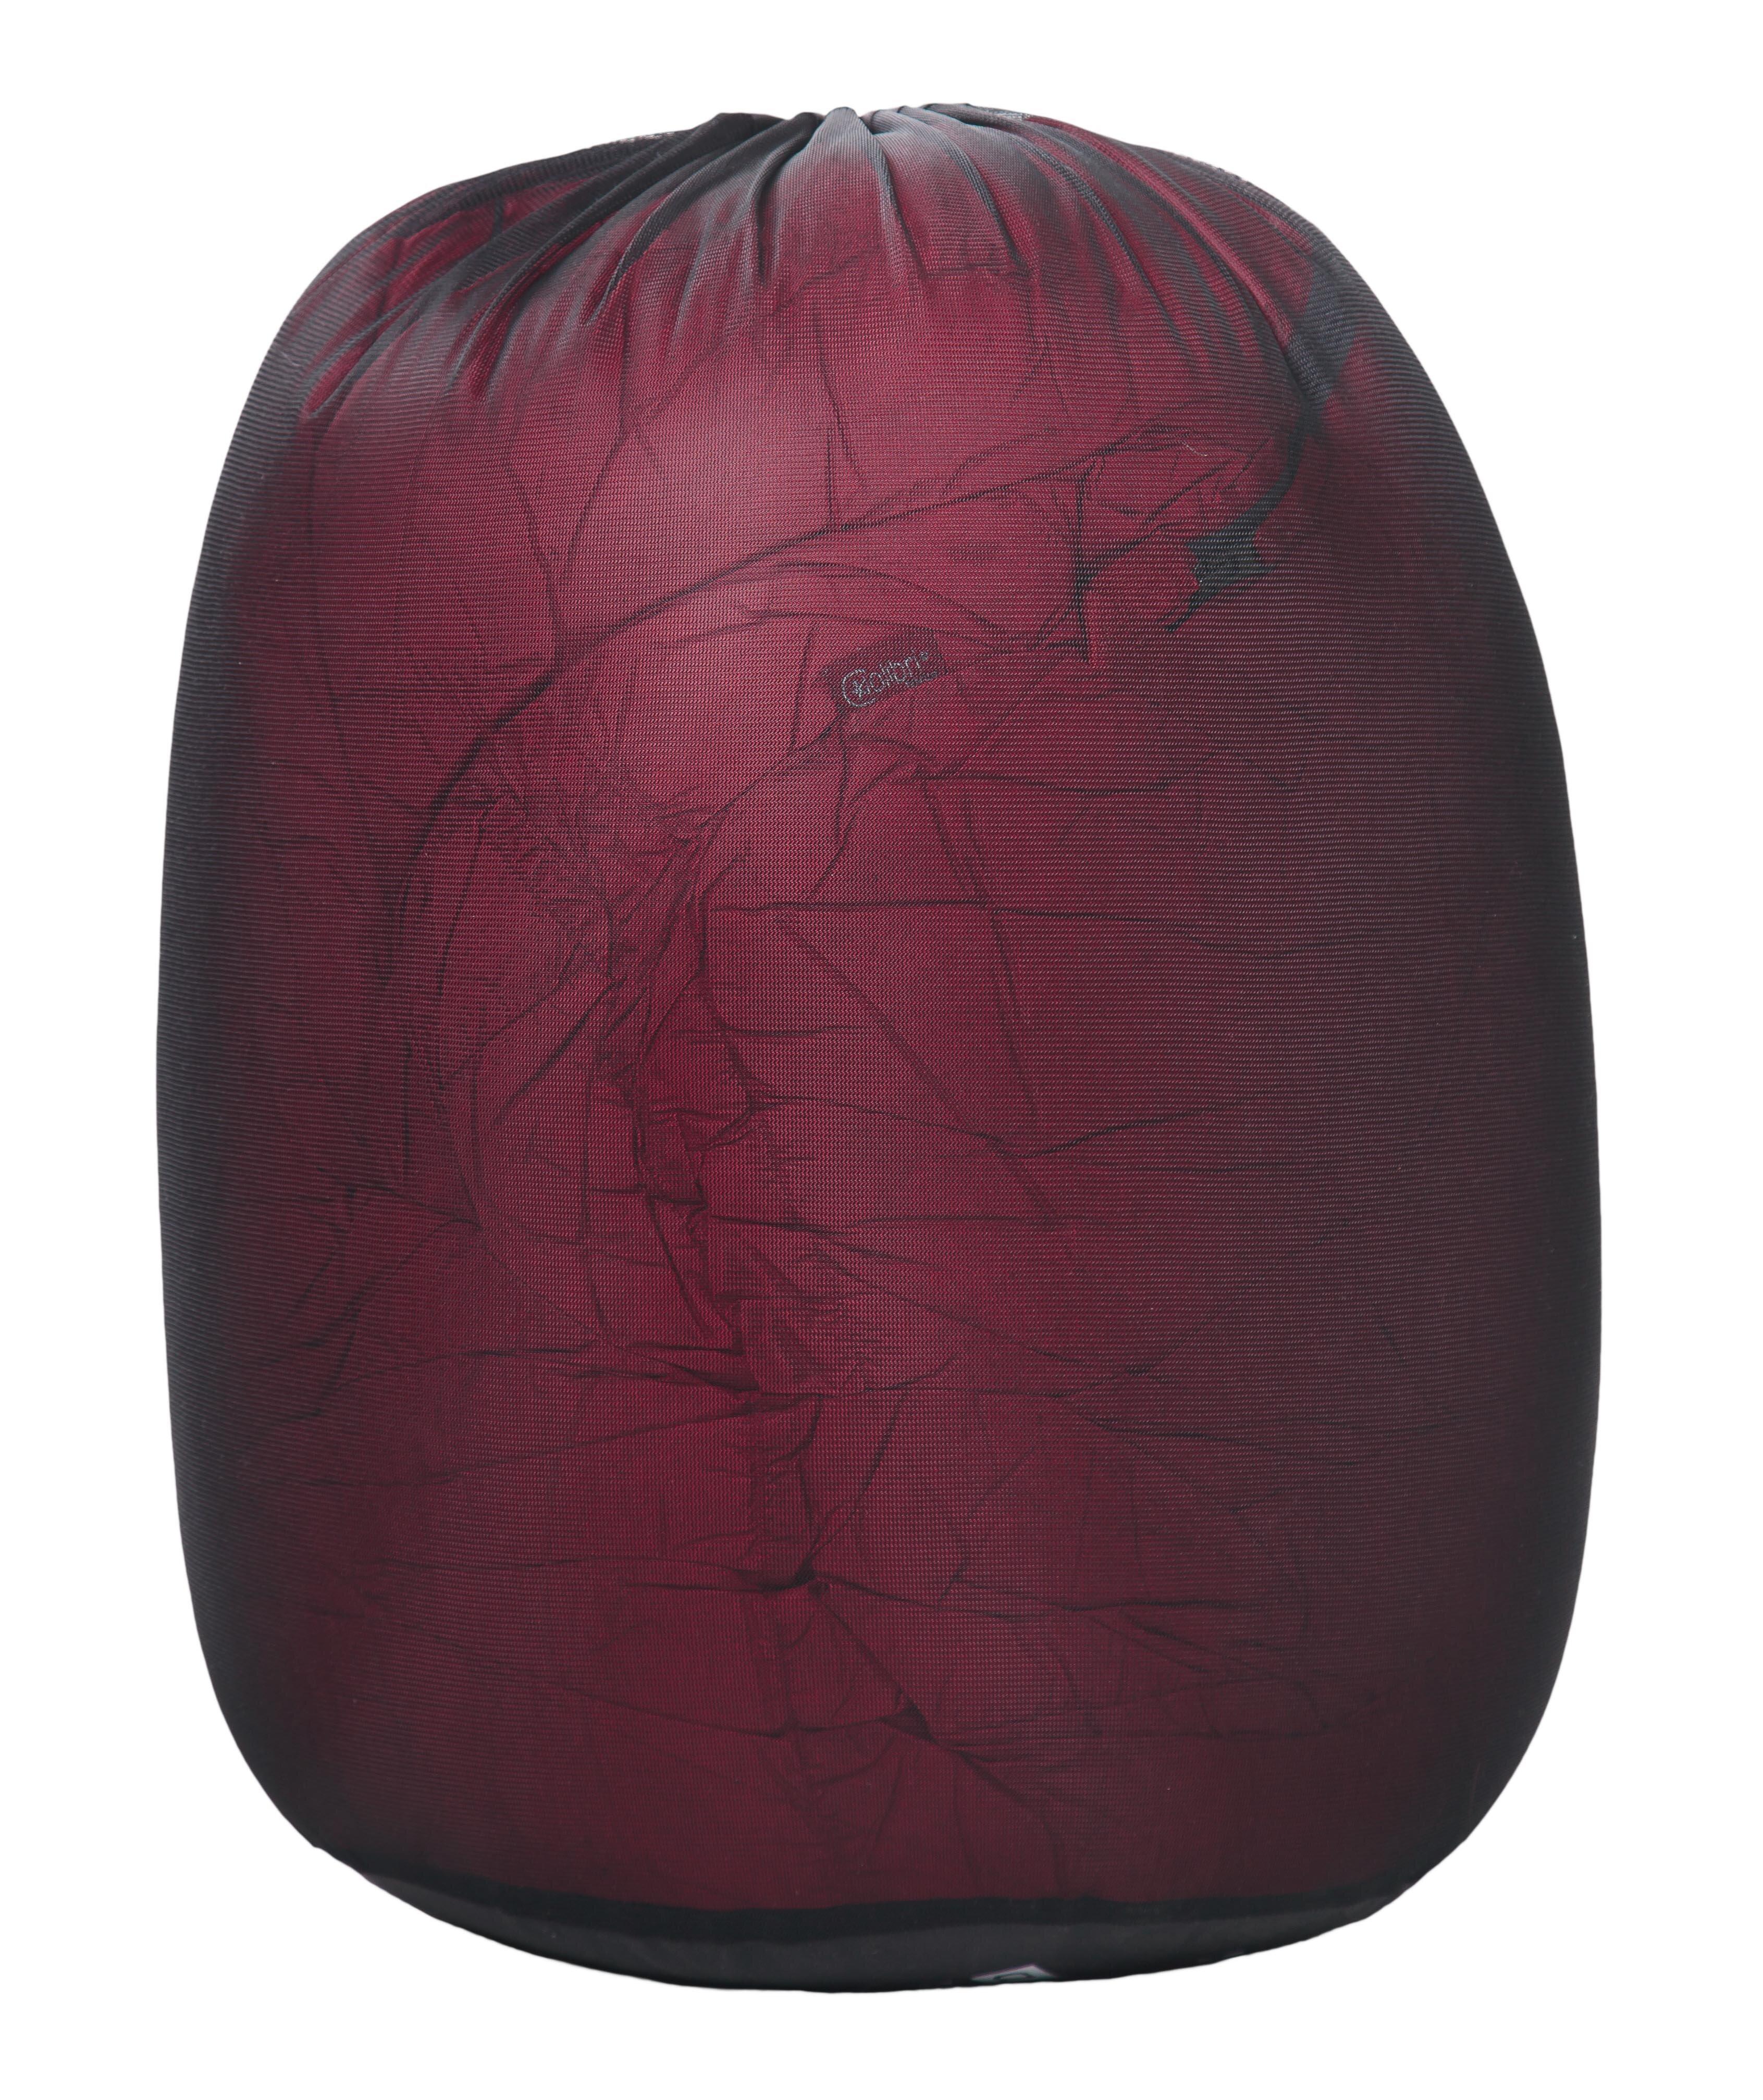 Warmpeace Storage sack